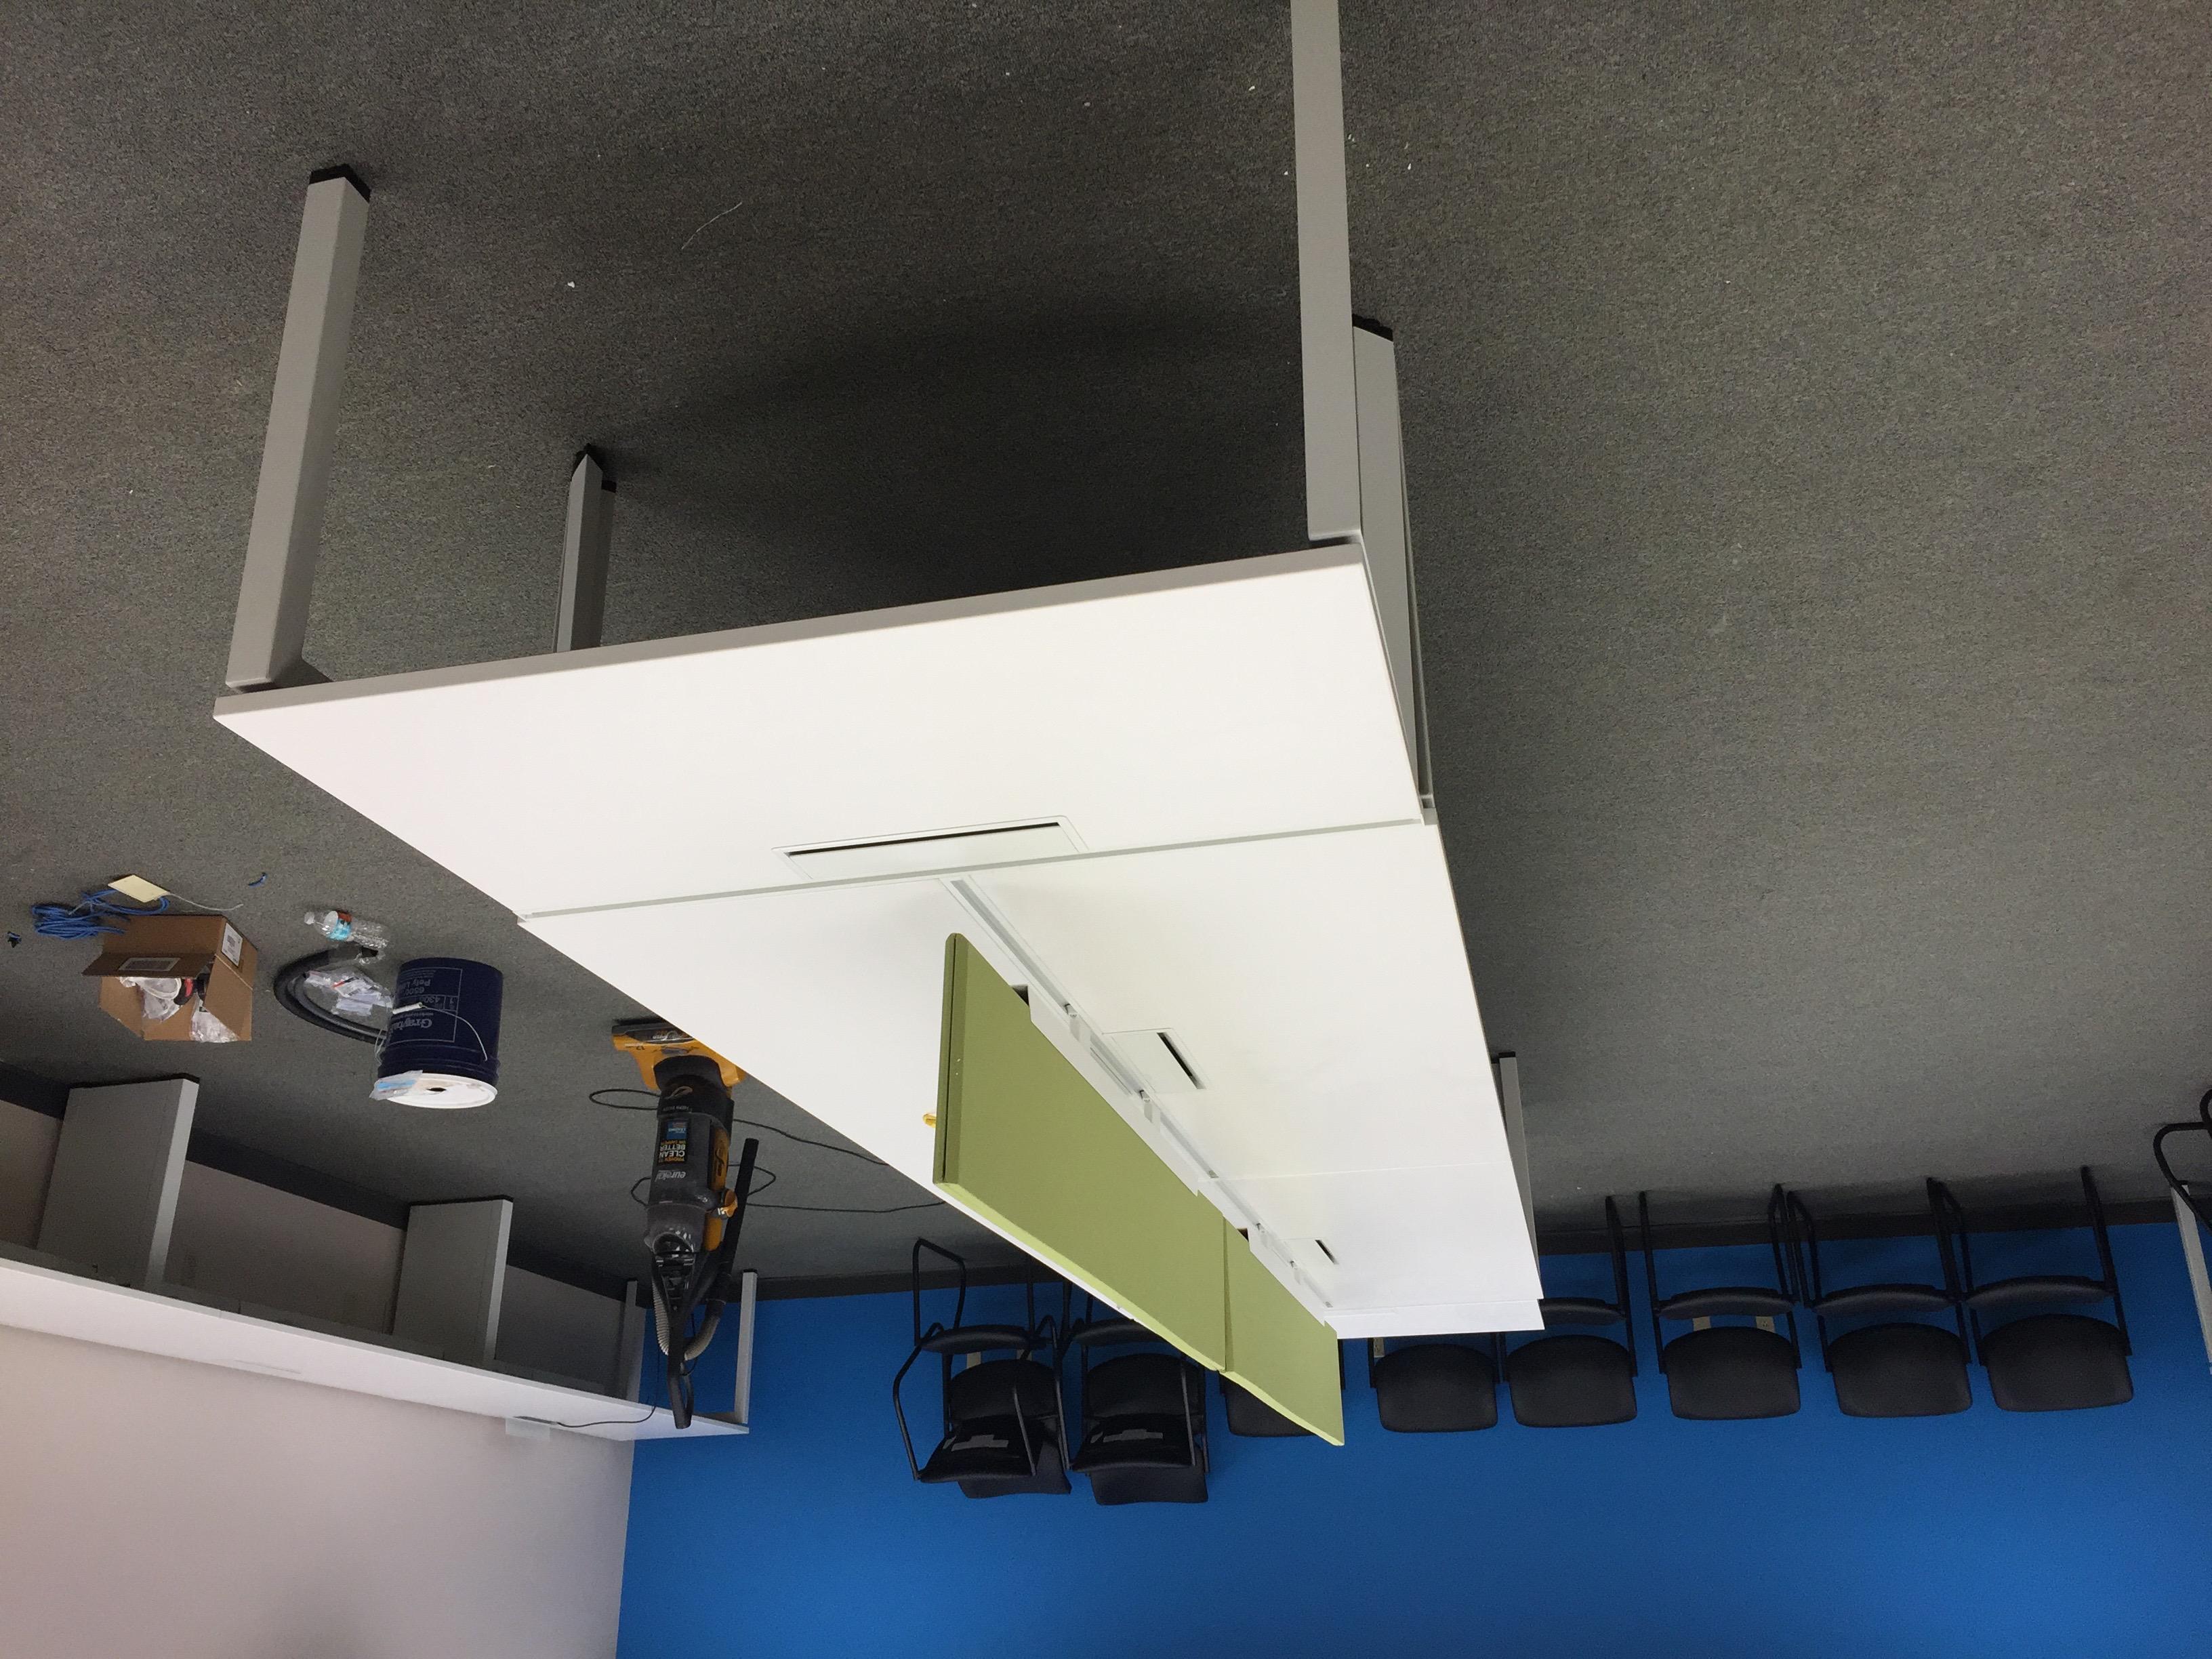 verity-benching-tables-in-sarasota-florida-manasota-office-supplies-llc.jpg